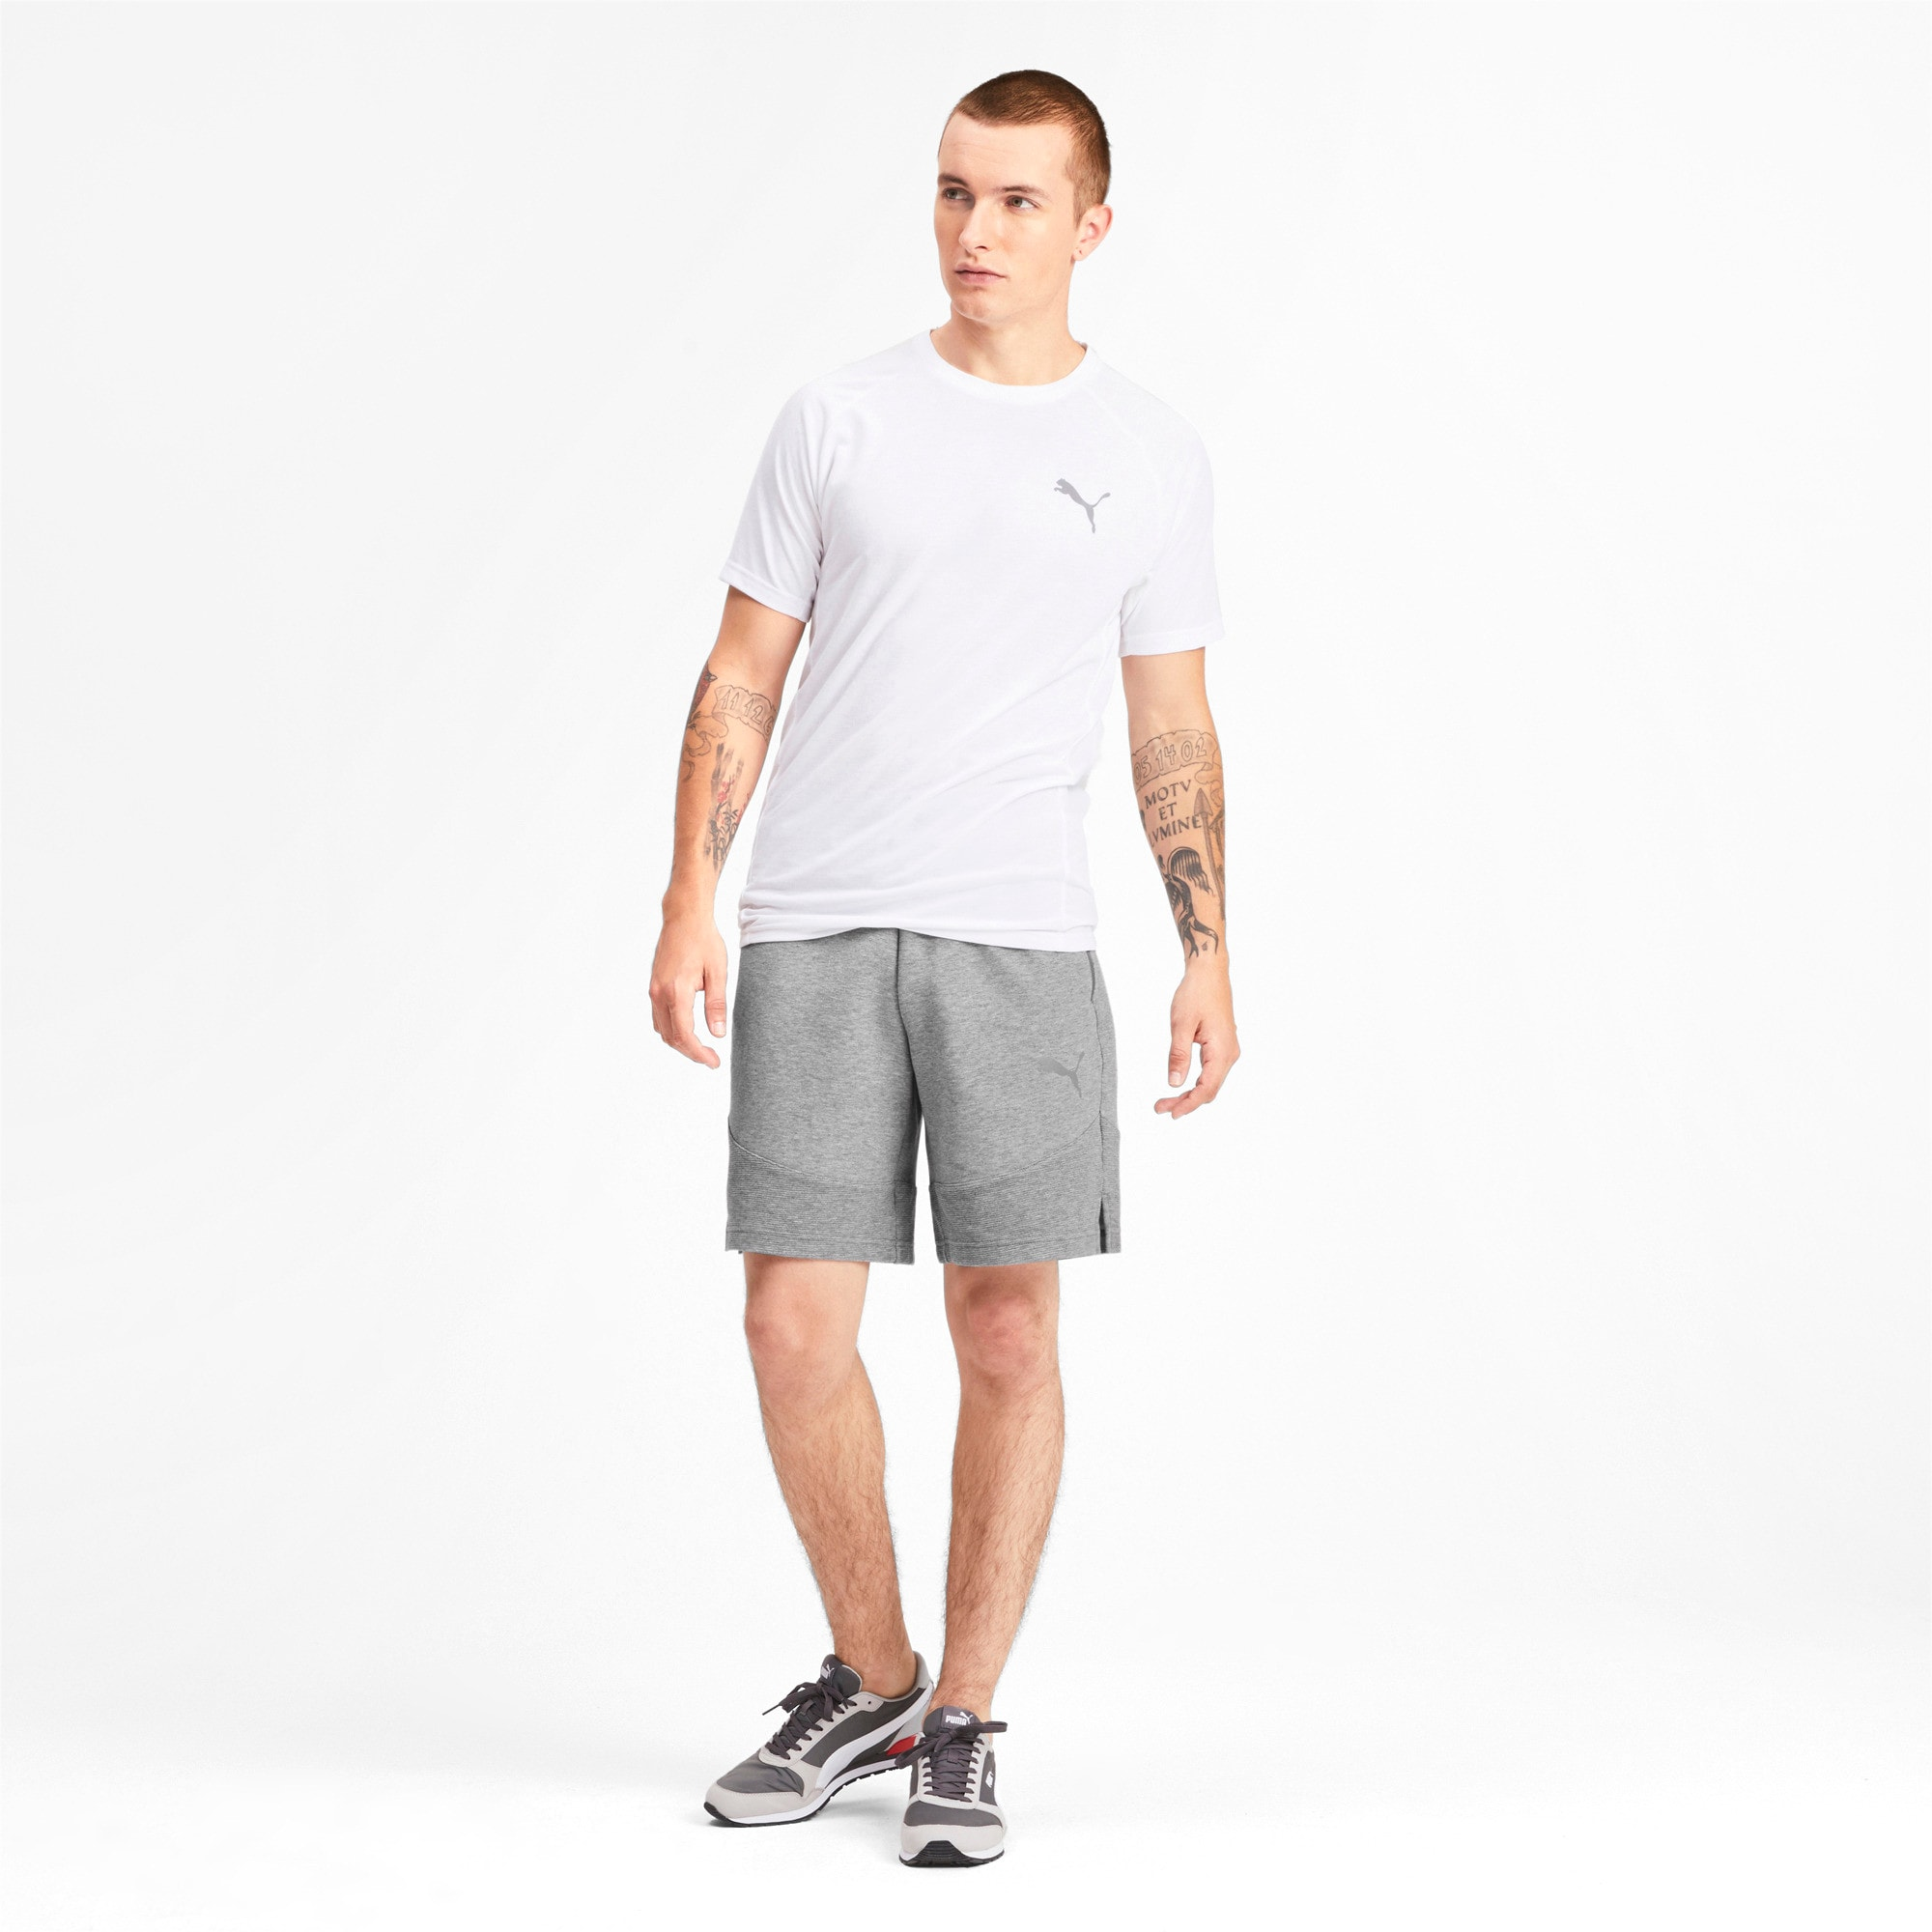 Thumbnail 3 of Evostripe Men's Shorts, Medium Gray Heather, medium